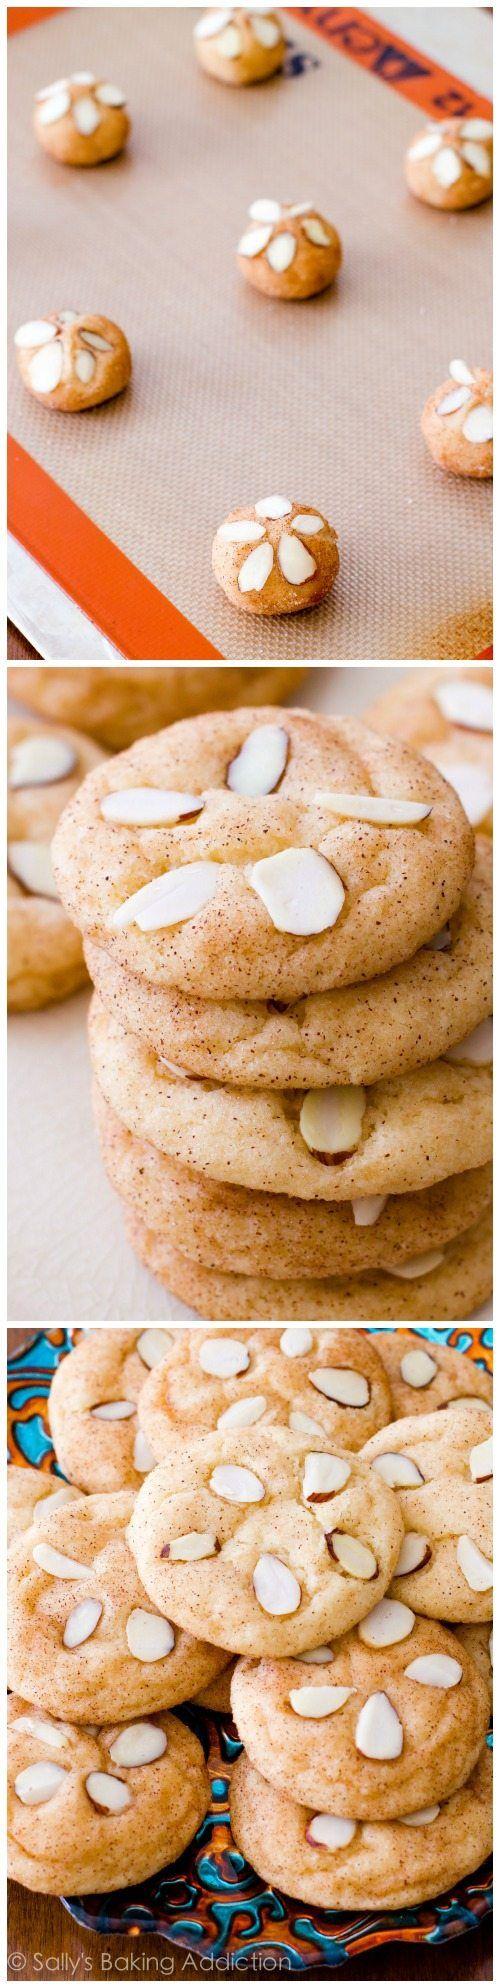 An easy recipe for cinnamon sugar sand dollar cookies.